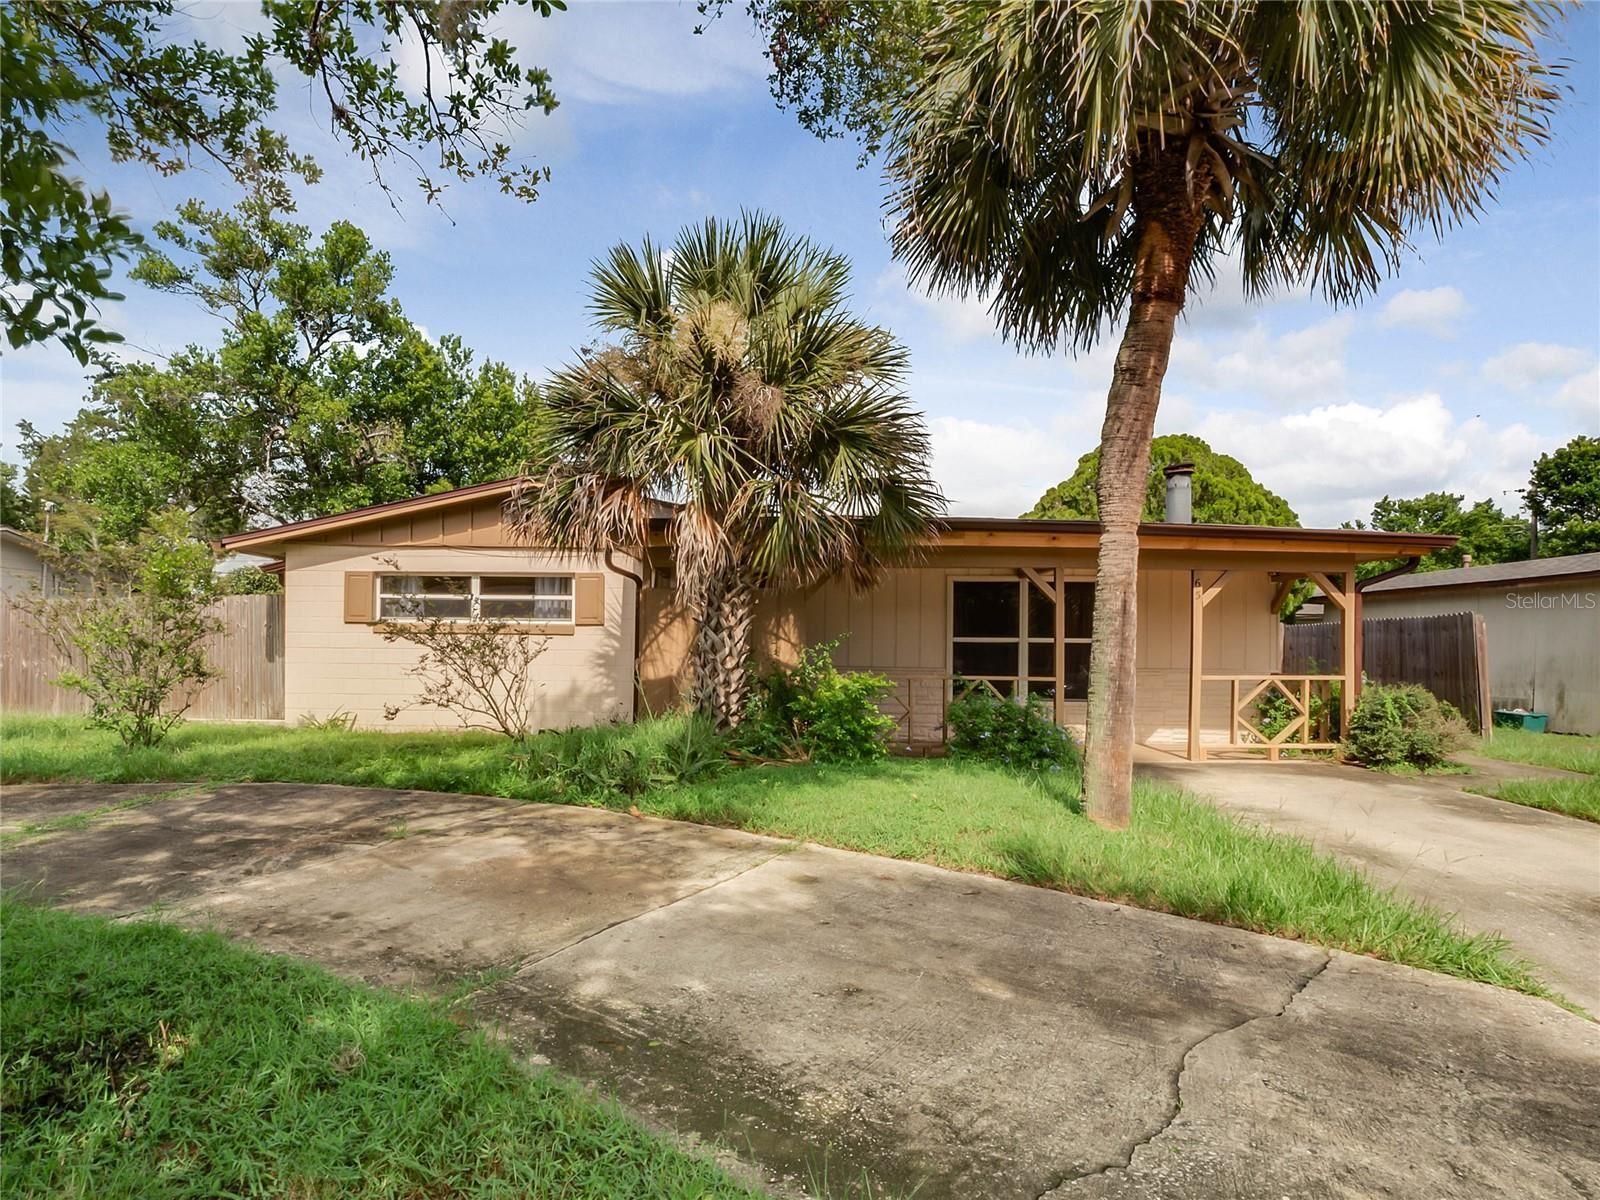 65 S EDGEMON AVENUE, Winter Springs, FL 32708 - #: O5964688